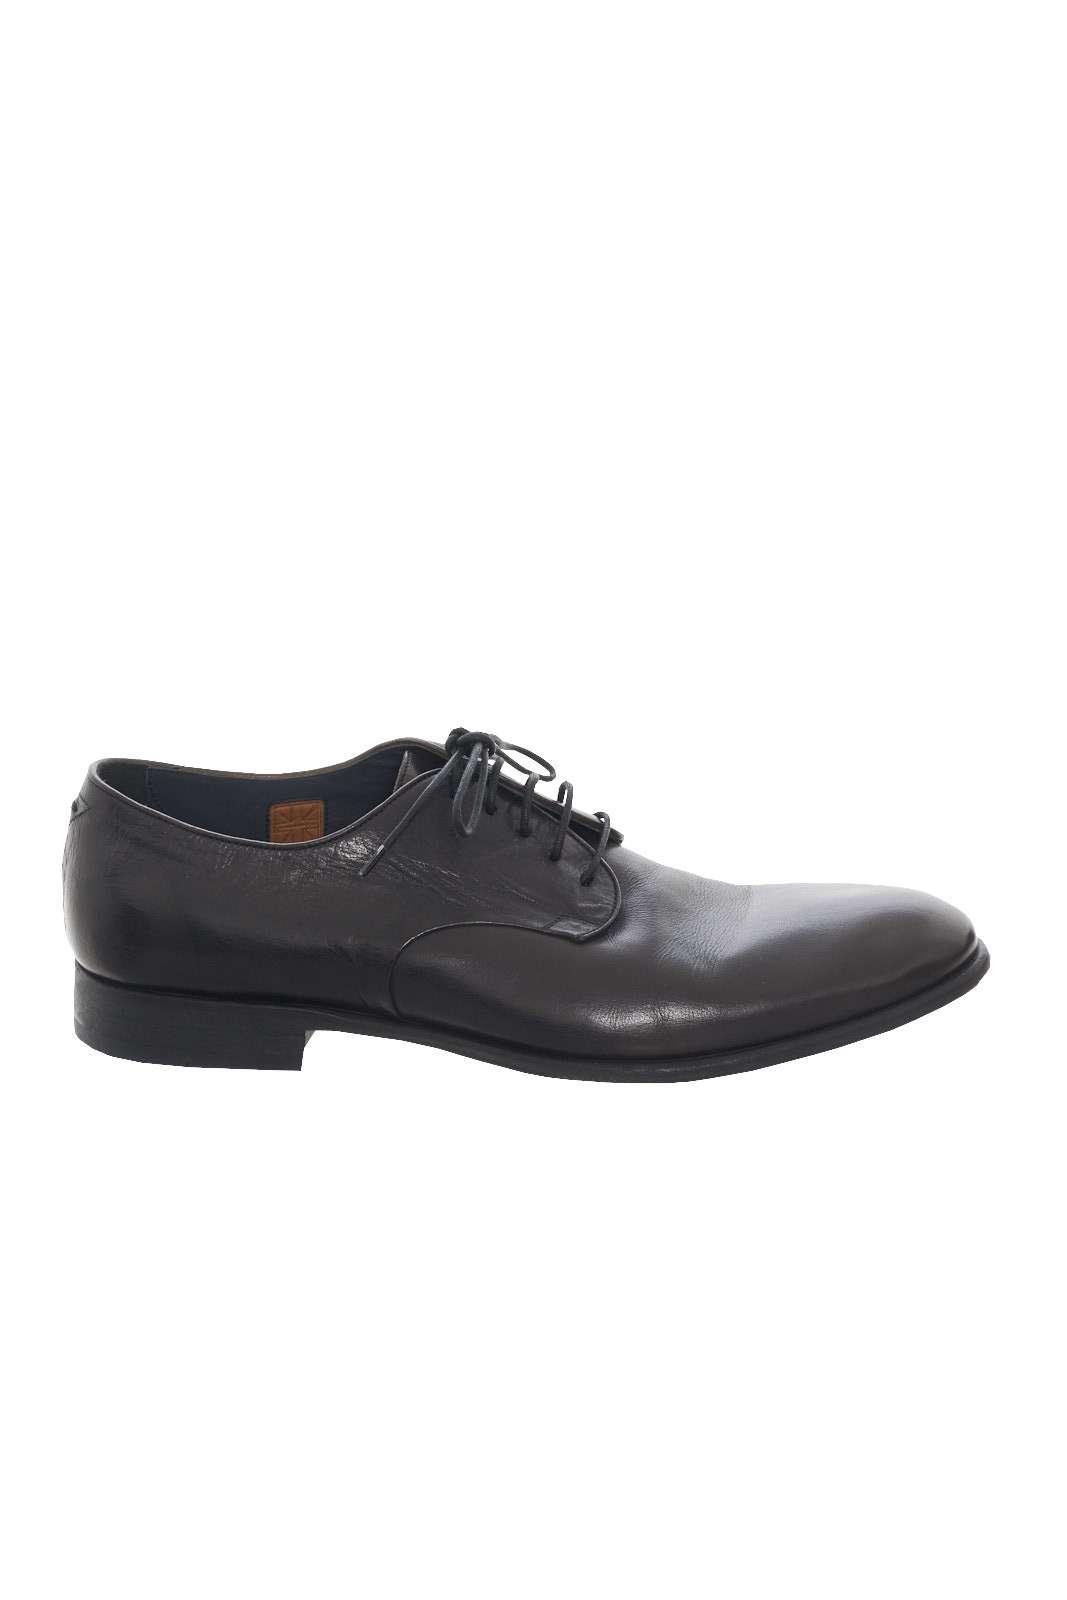 https://www.parmax.com/media/catalog/product/a/i/AI-outlet_parmax-scarpe-uomo-Pantanetti-1142-A.jpg